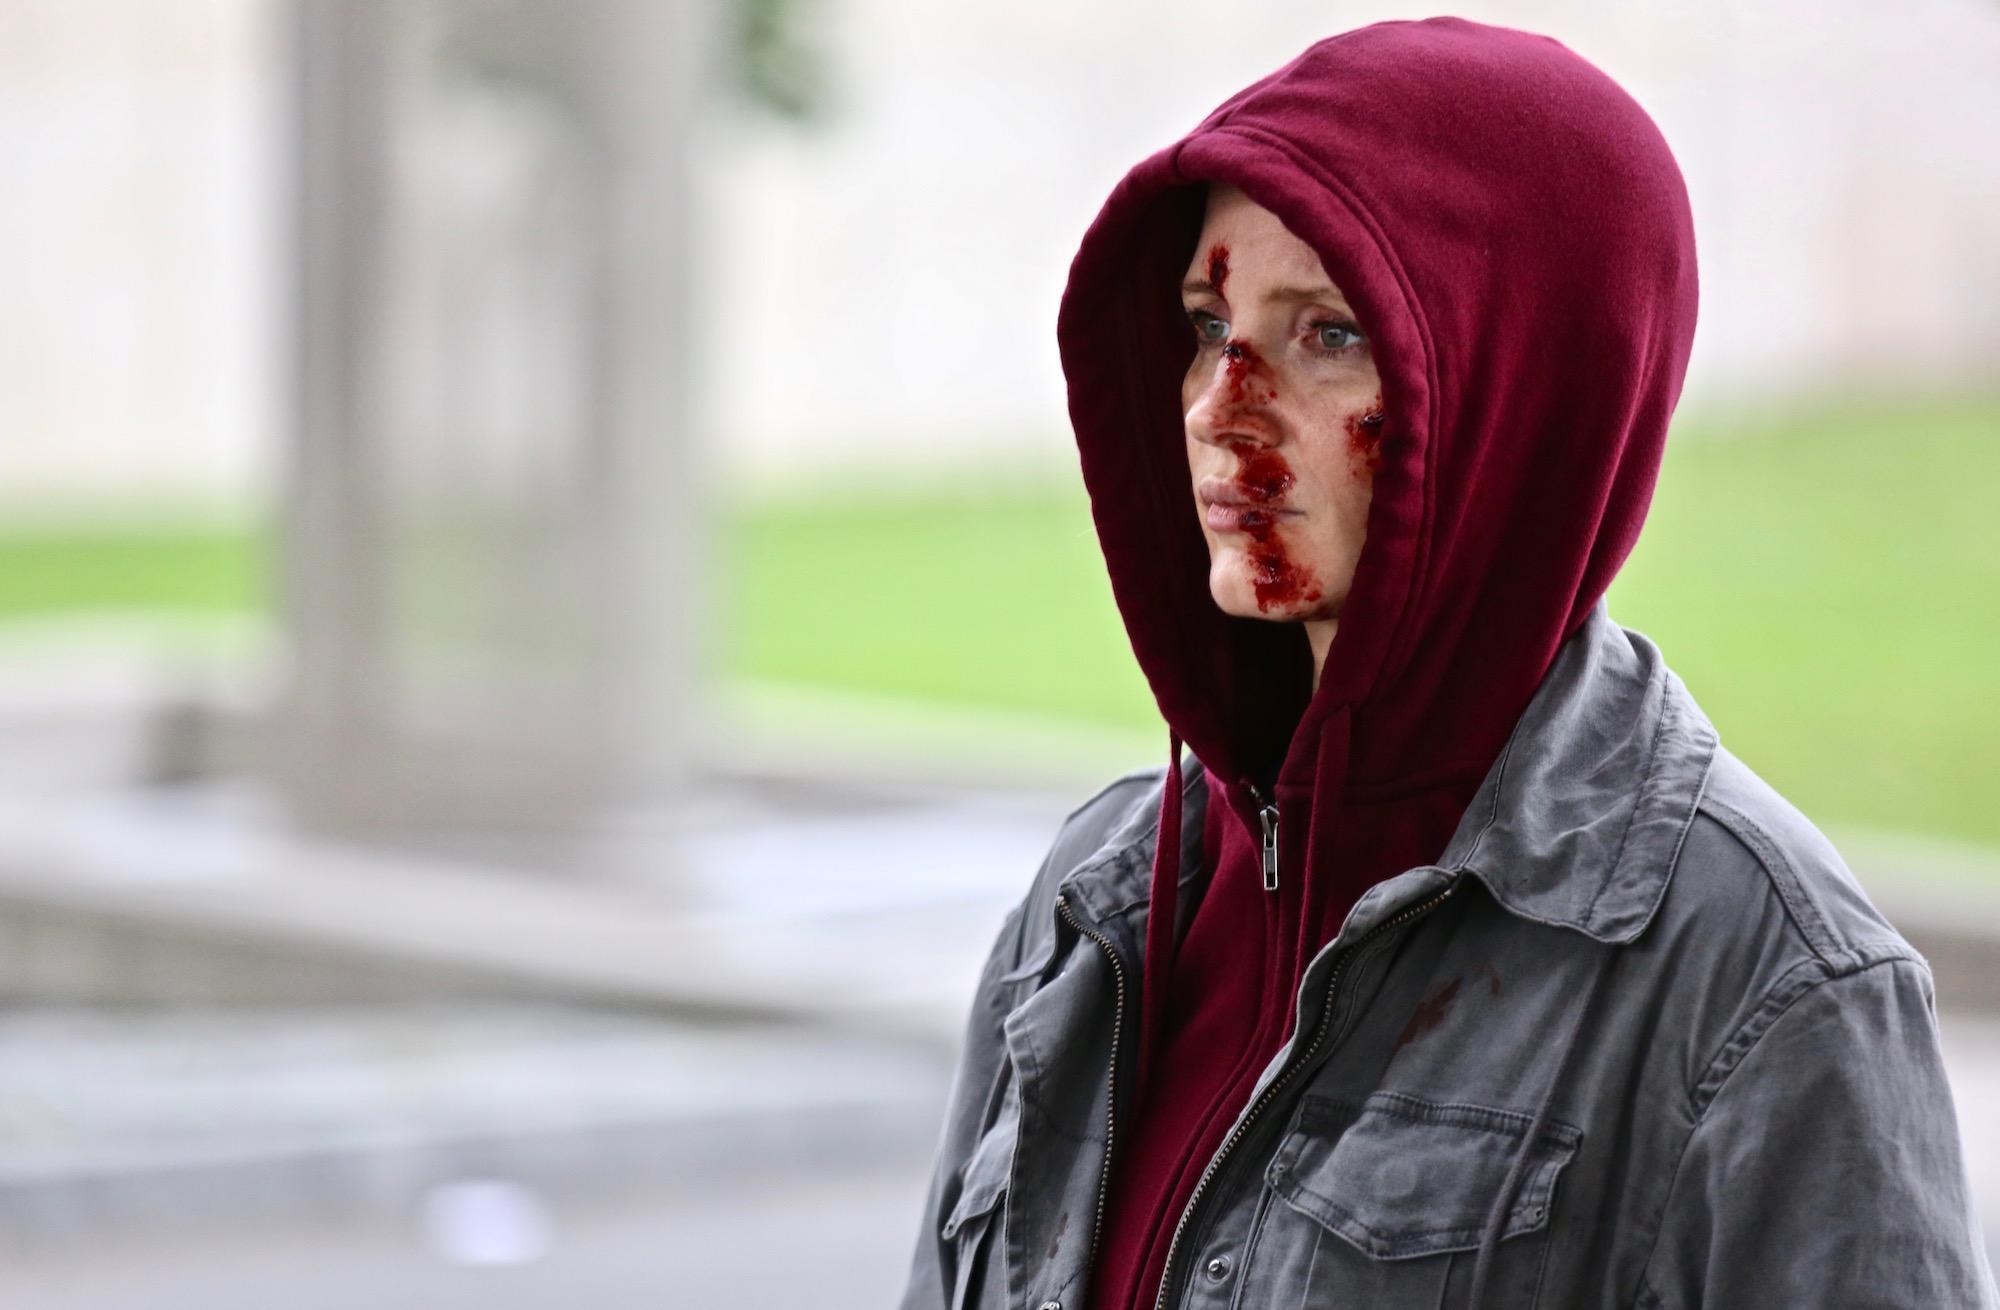 Jessica Chastain bérgyilkosnak áll – Ava (2020) – premierkritika